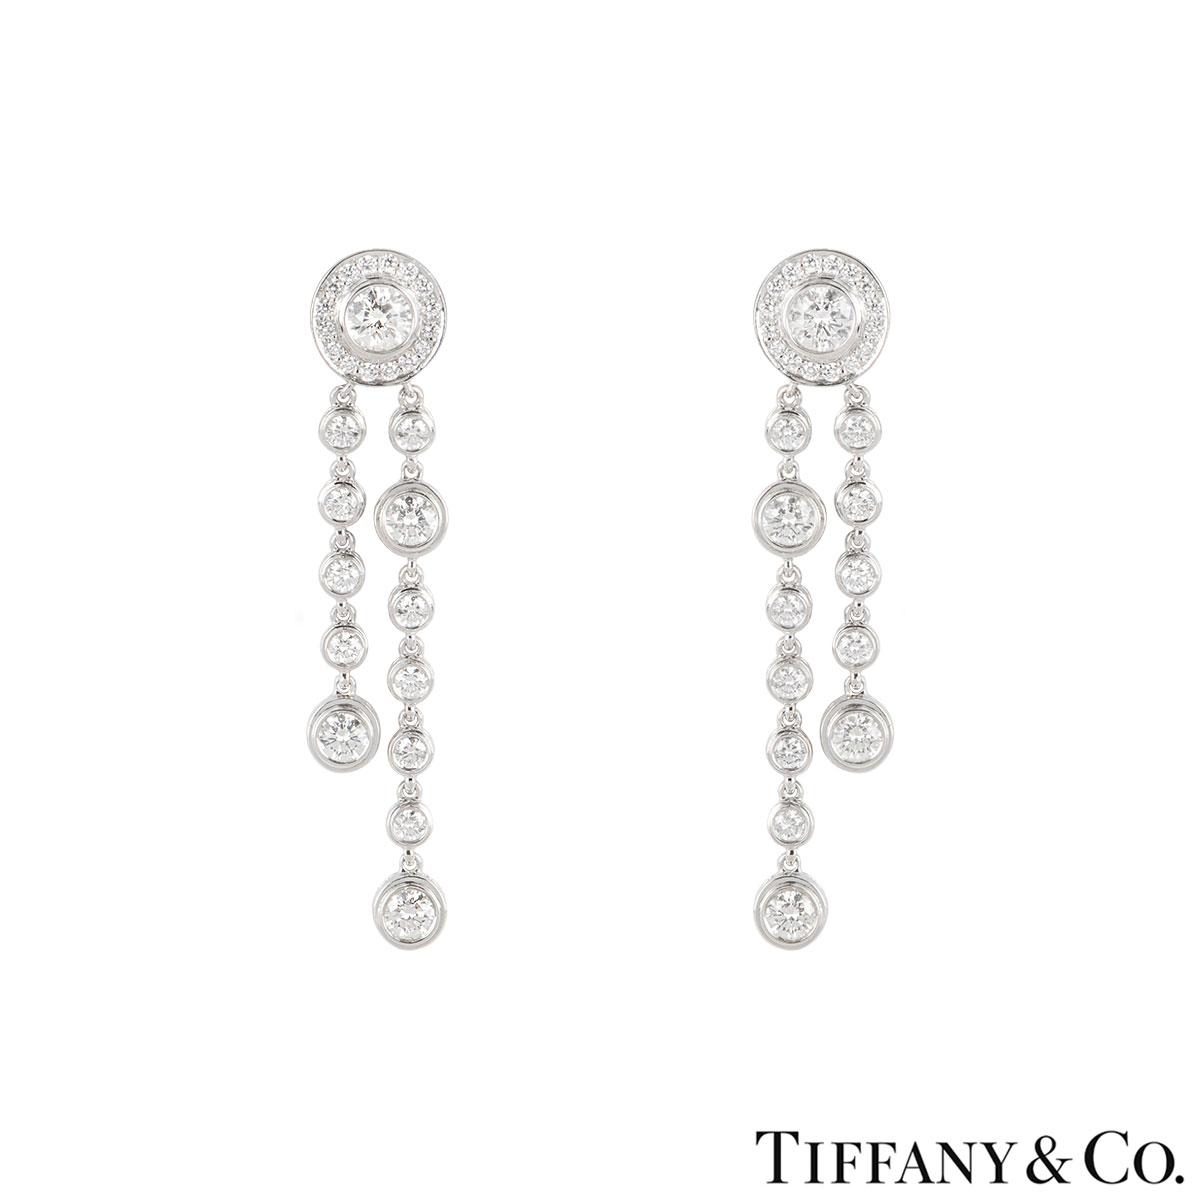 Tiffany & Co. Platinum Diamond Circlet Earrings